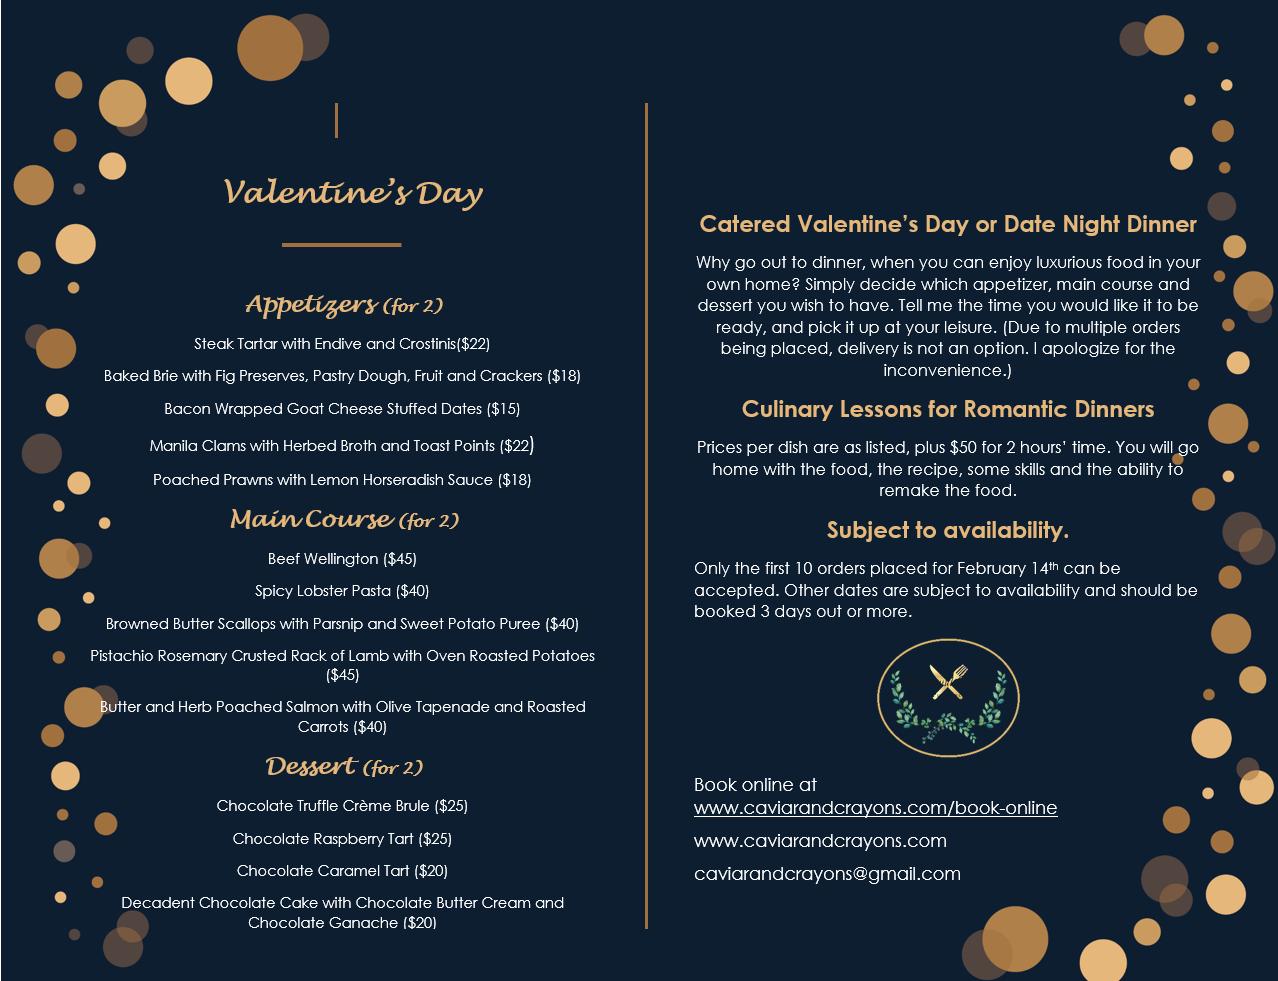 Valentine's Day/Date Night